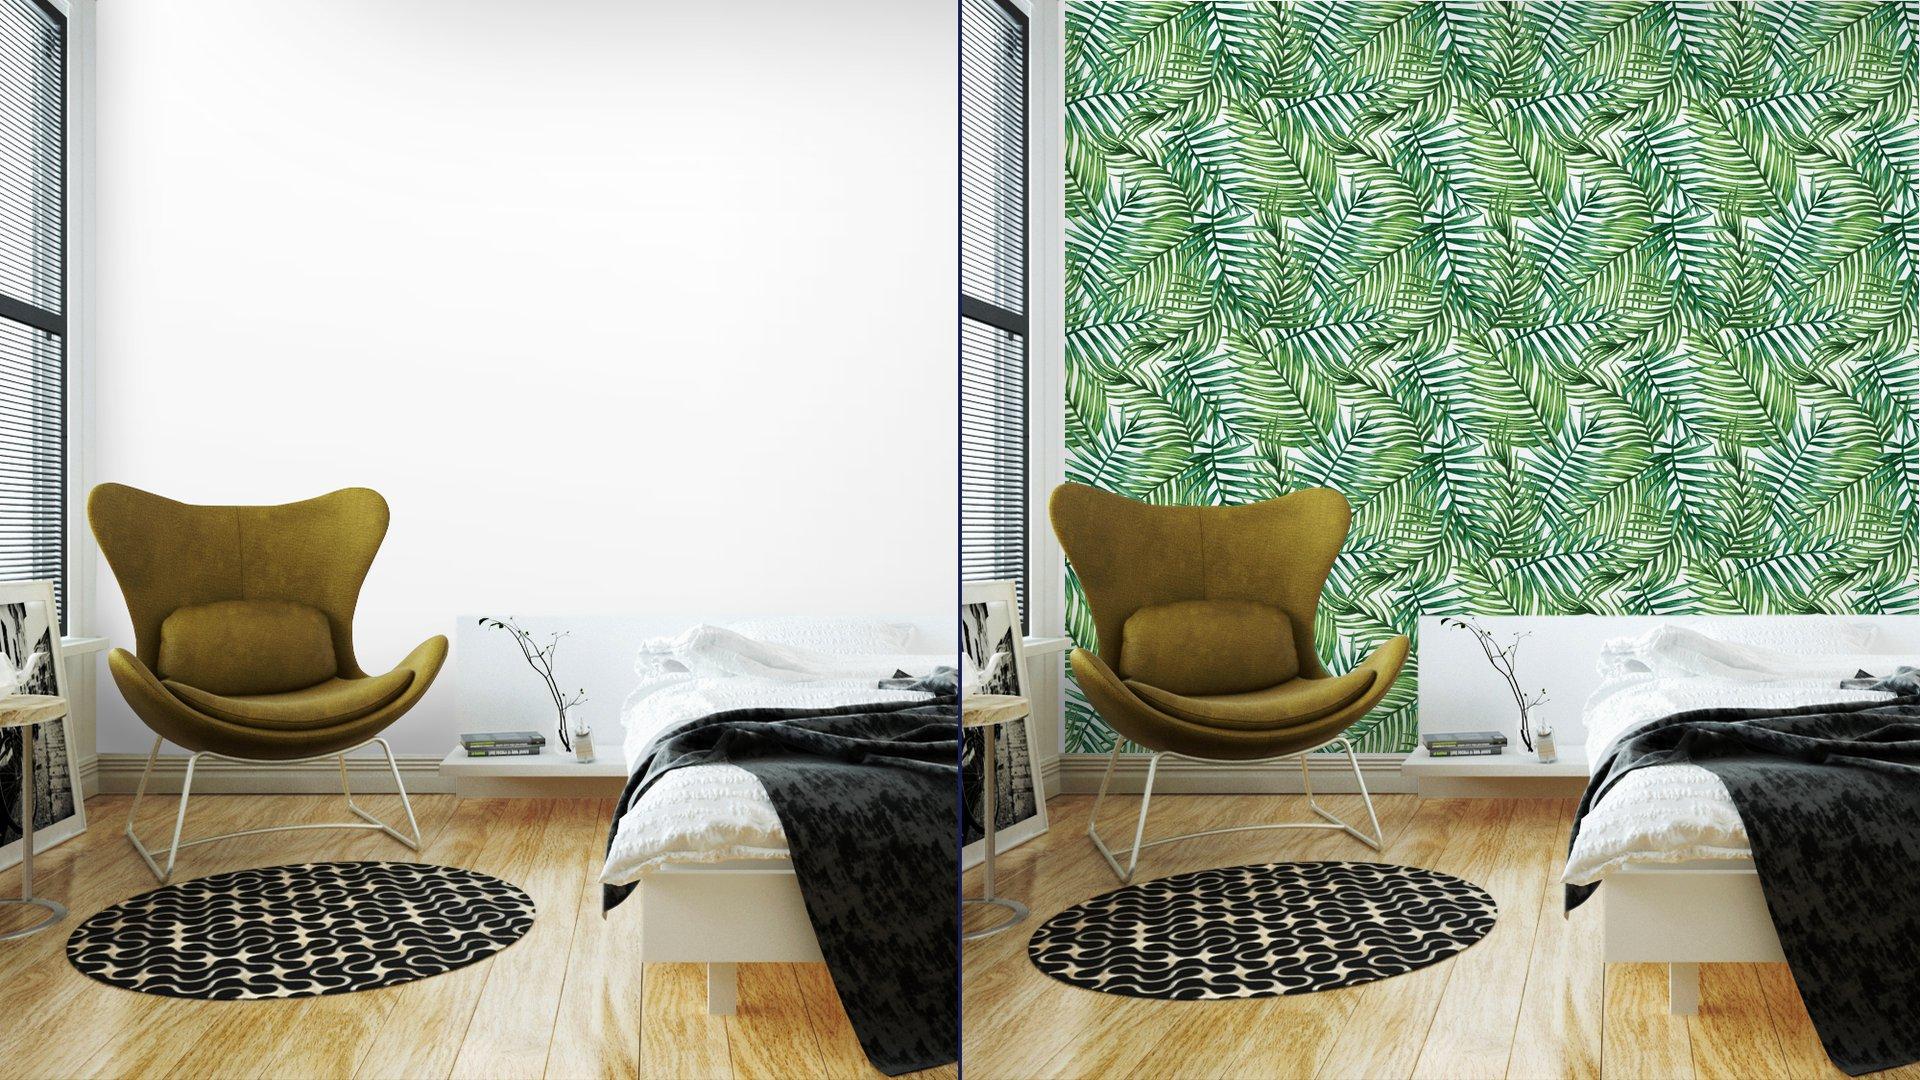 Fotomurales mexico papeles pintados autoadhesivos watercolor tropical palm leaves seamless pattern vector illustration 4 - Papel Tapiz Hojas Tropicales Tipo Acuarela en Fondo Blanco 04